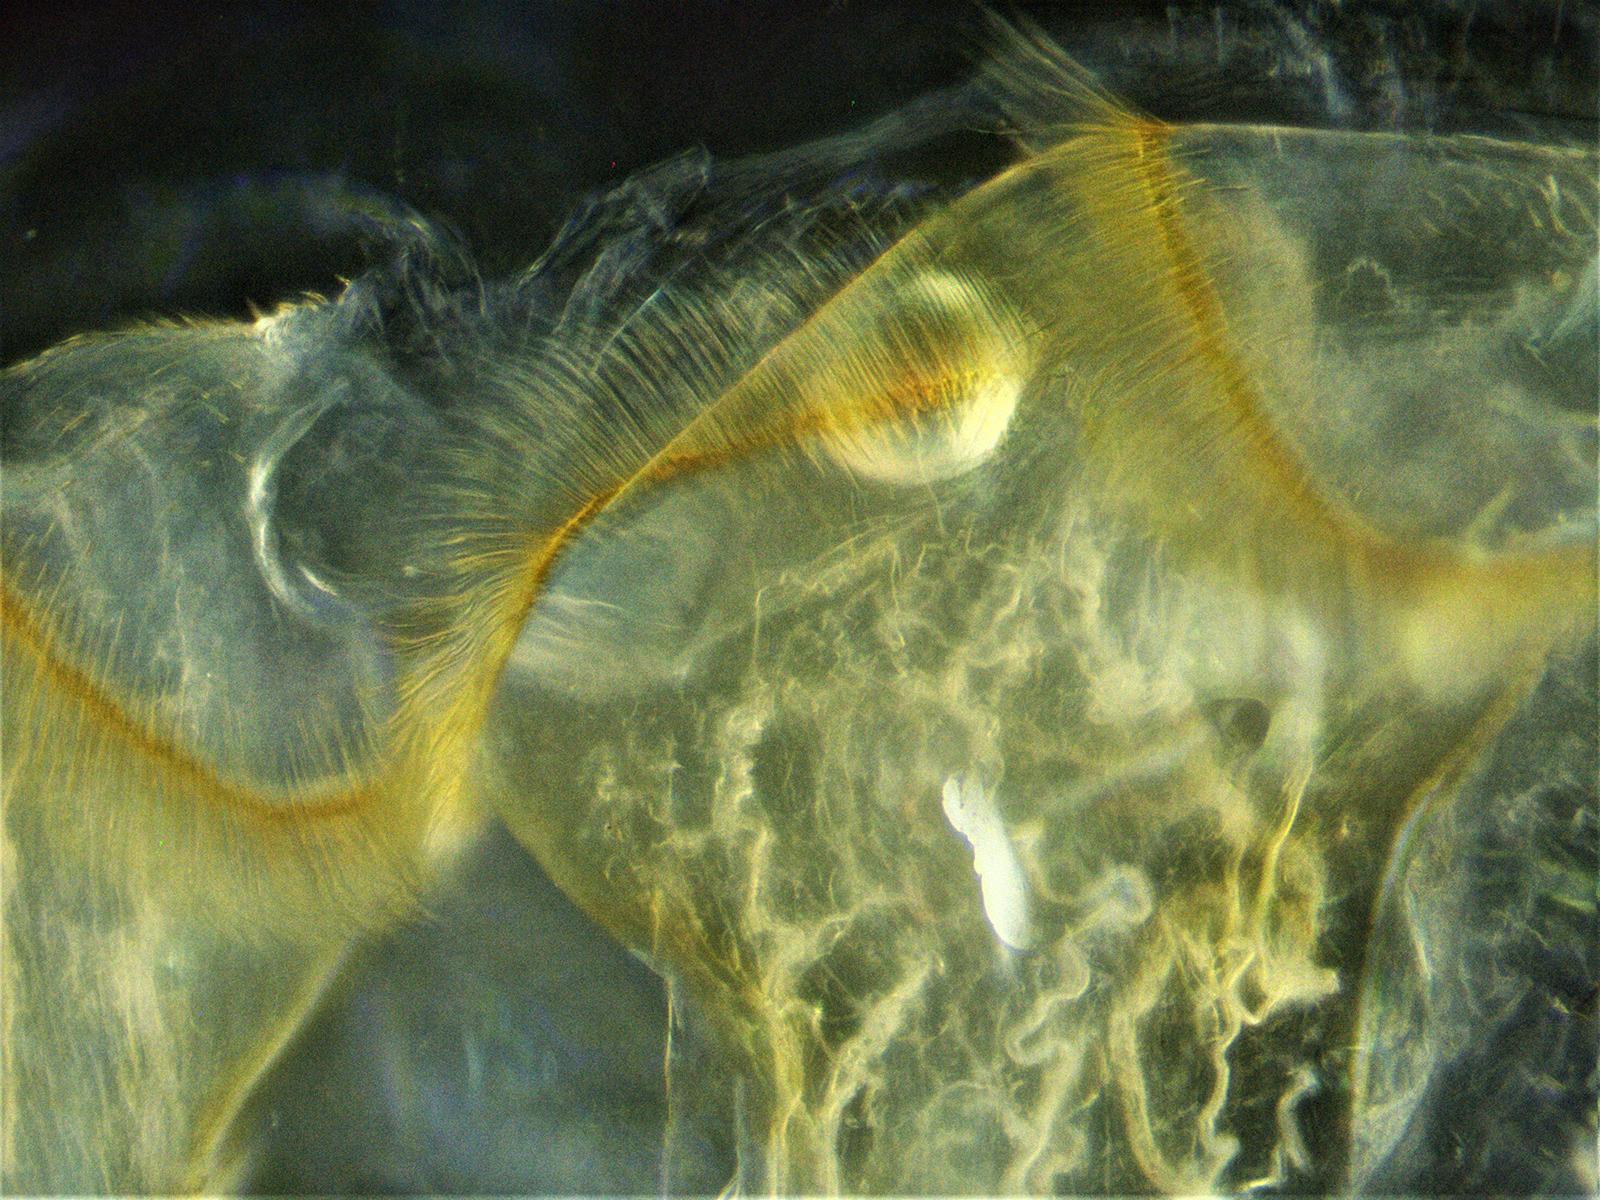 Honeybee proventriculus